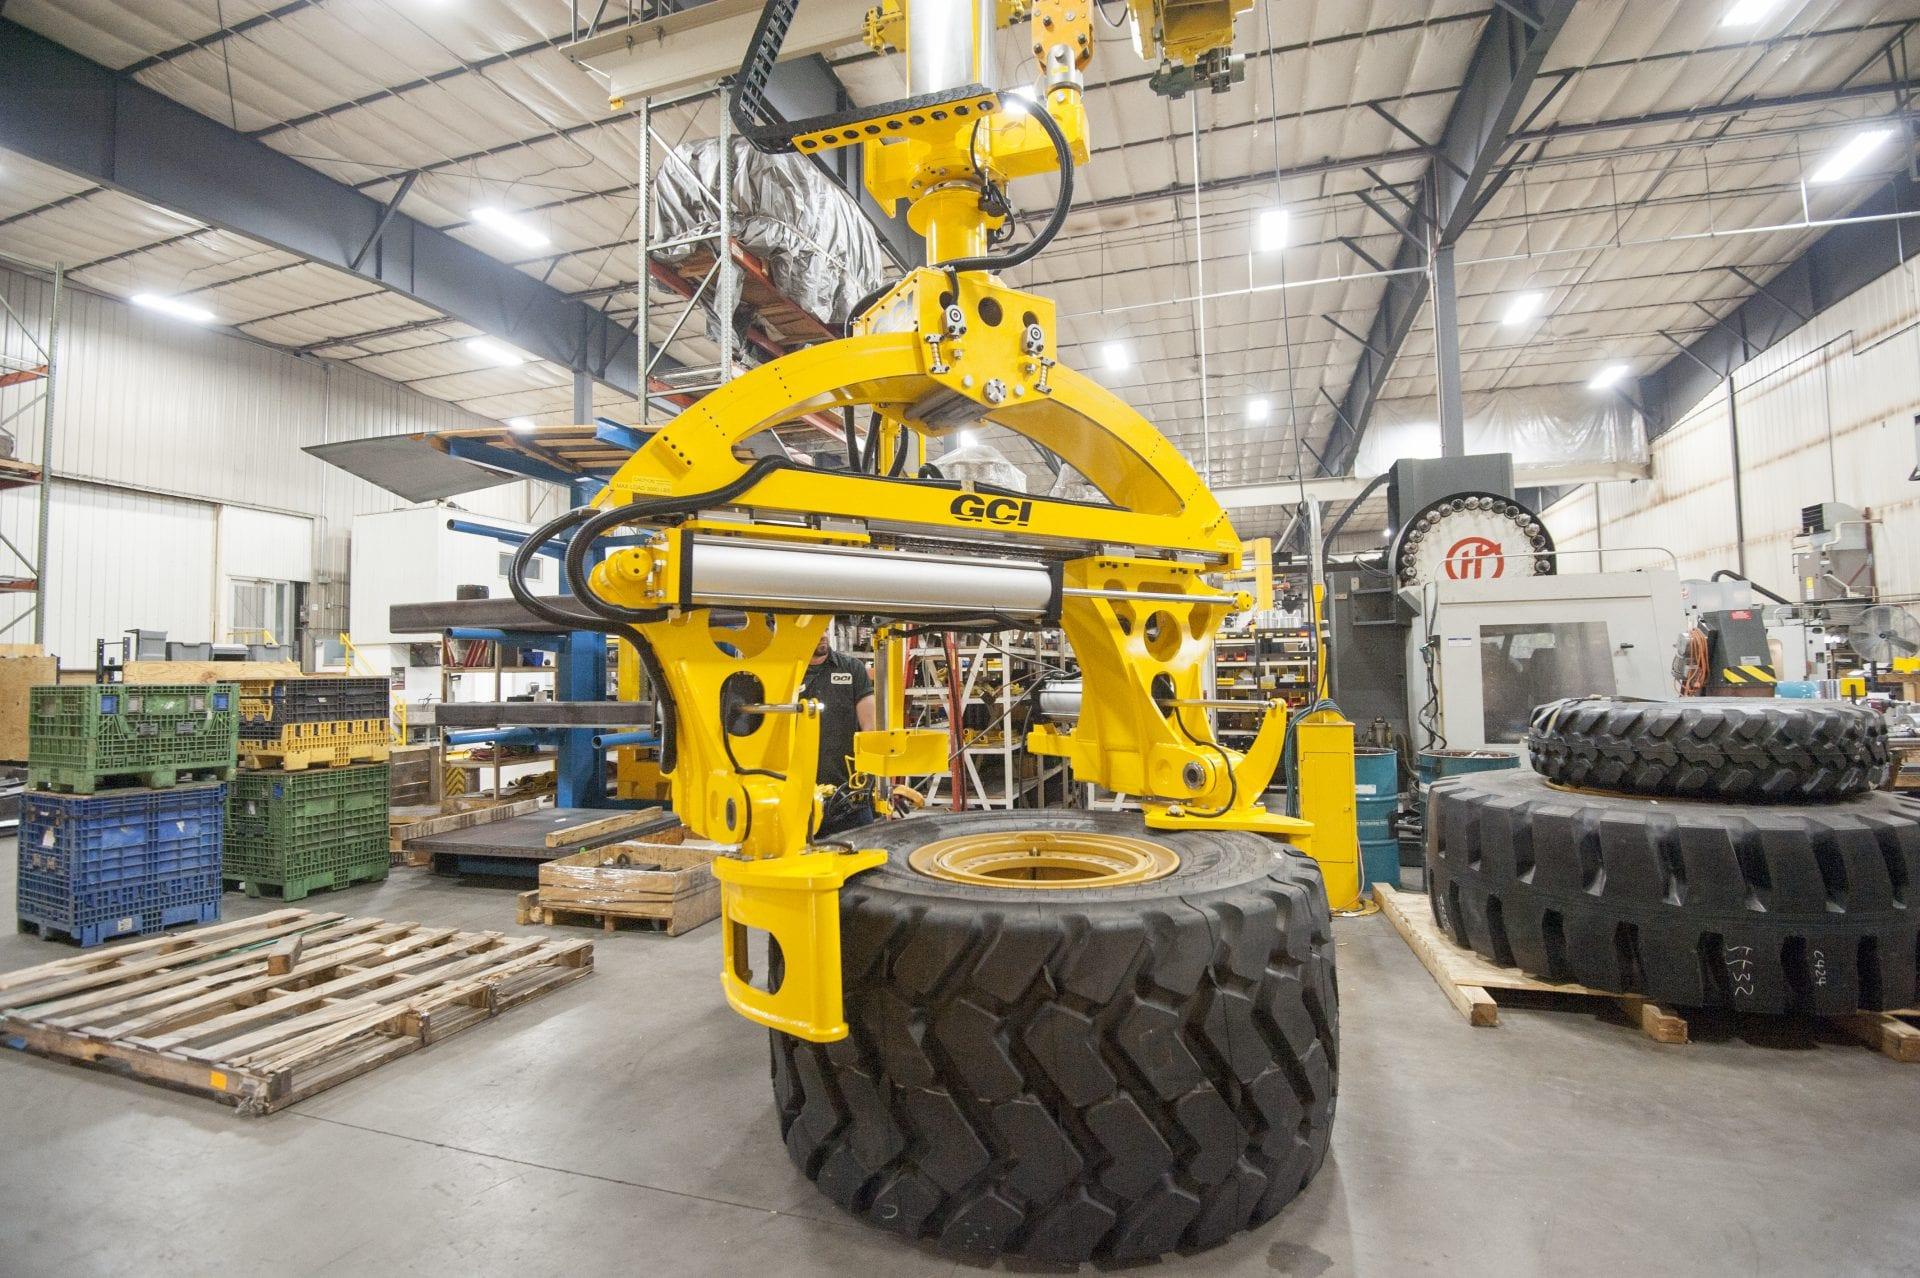 Overhead mount GCI manipulator lifting 3,000 lb Caterpillar tires of varying sizes